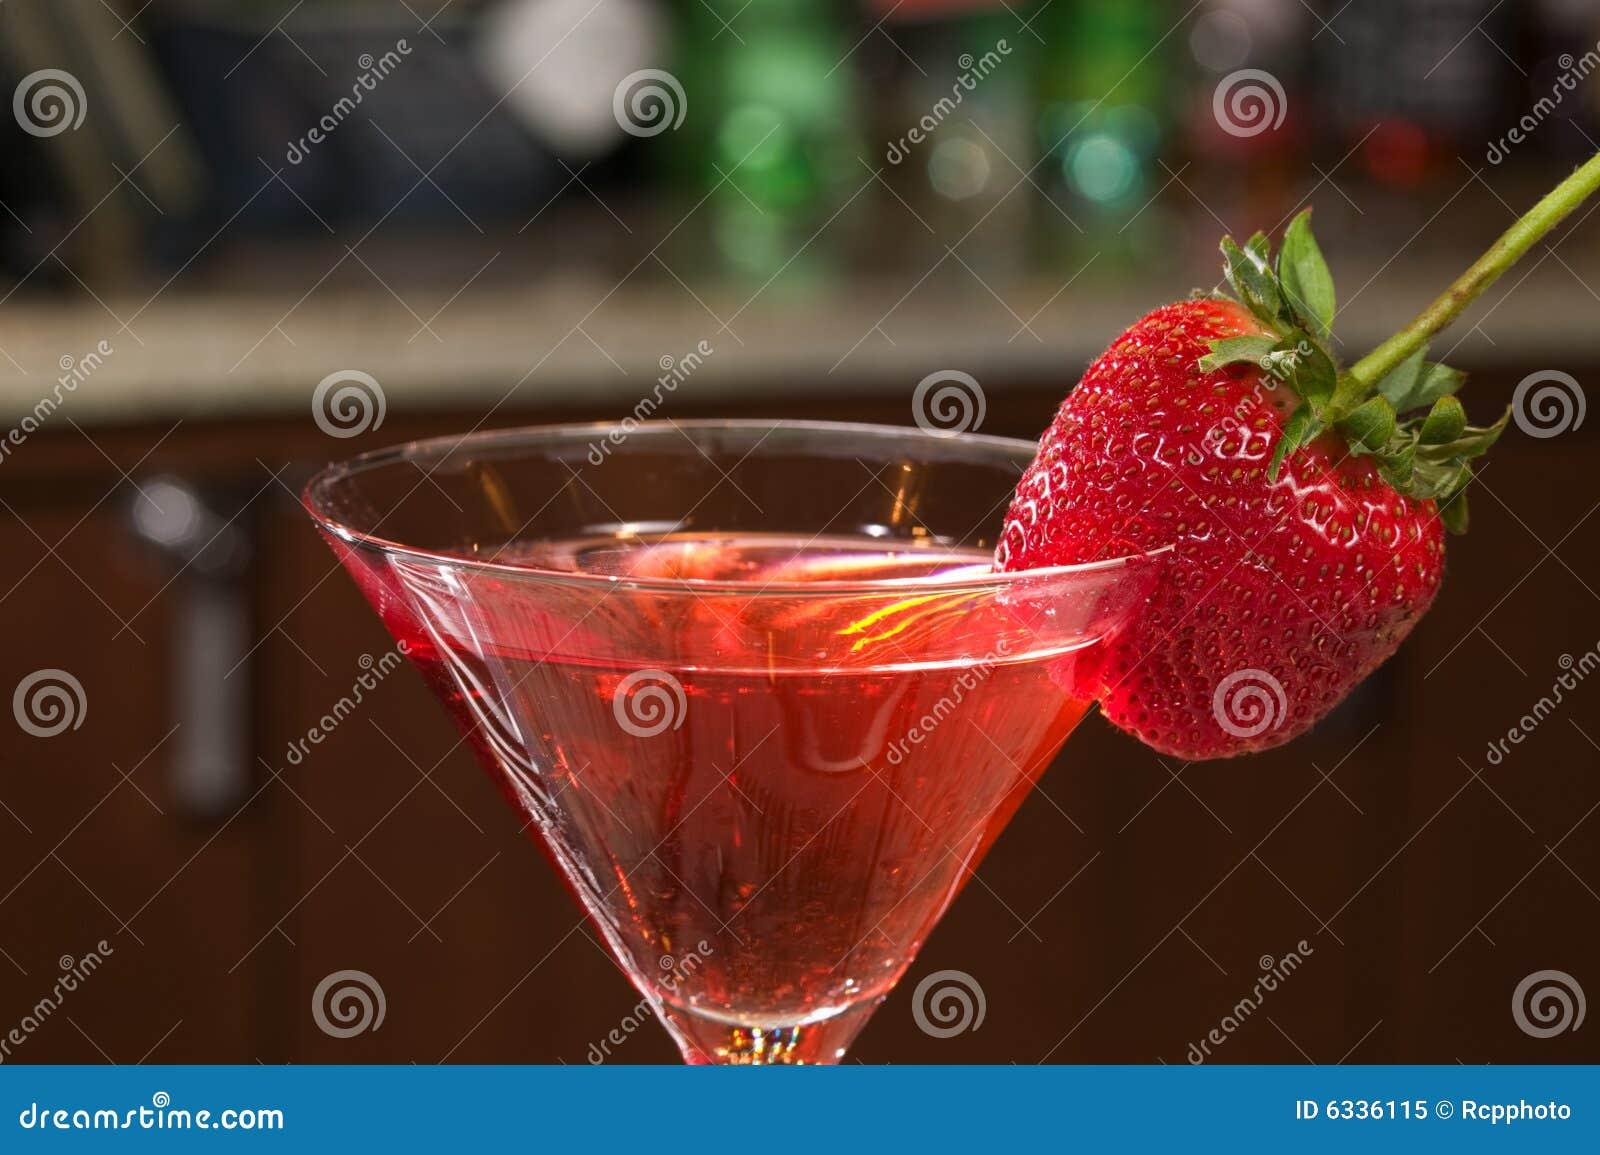 Strawberry Martini Royalty Free Stock Photo Image 6336115